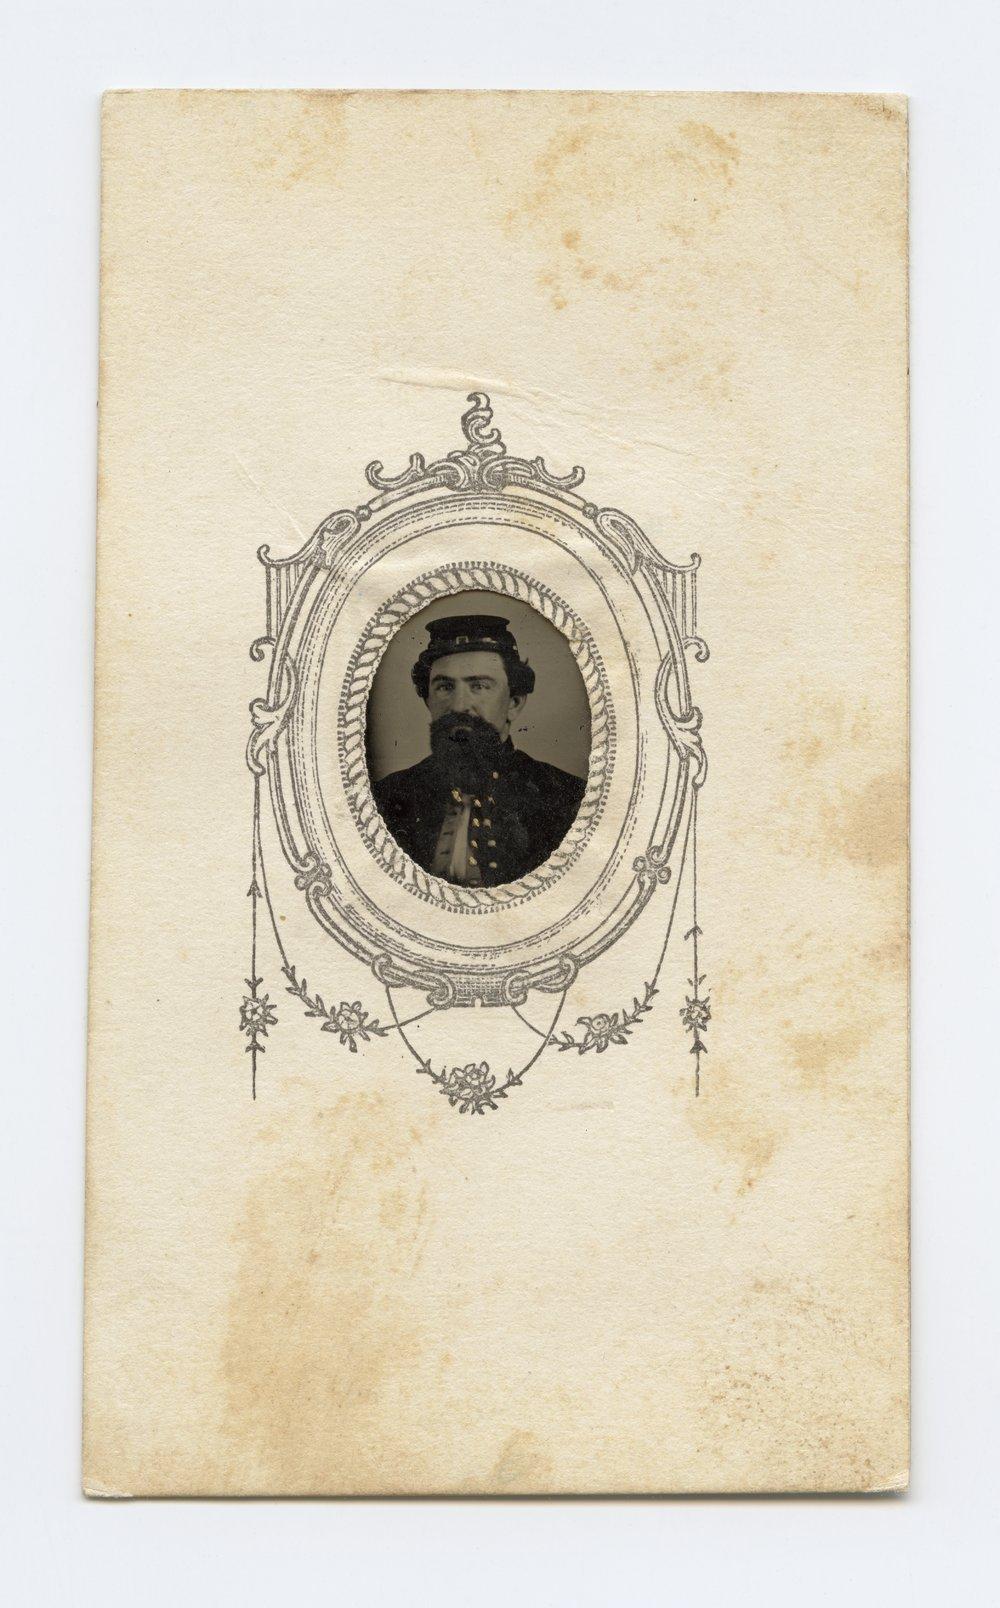 Unidentified member of the 11th Kansas Volunteer Cavalry